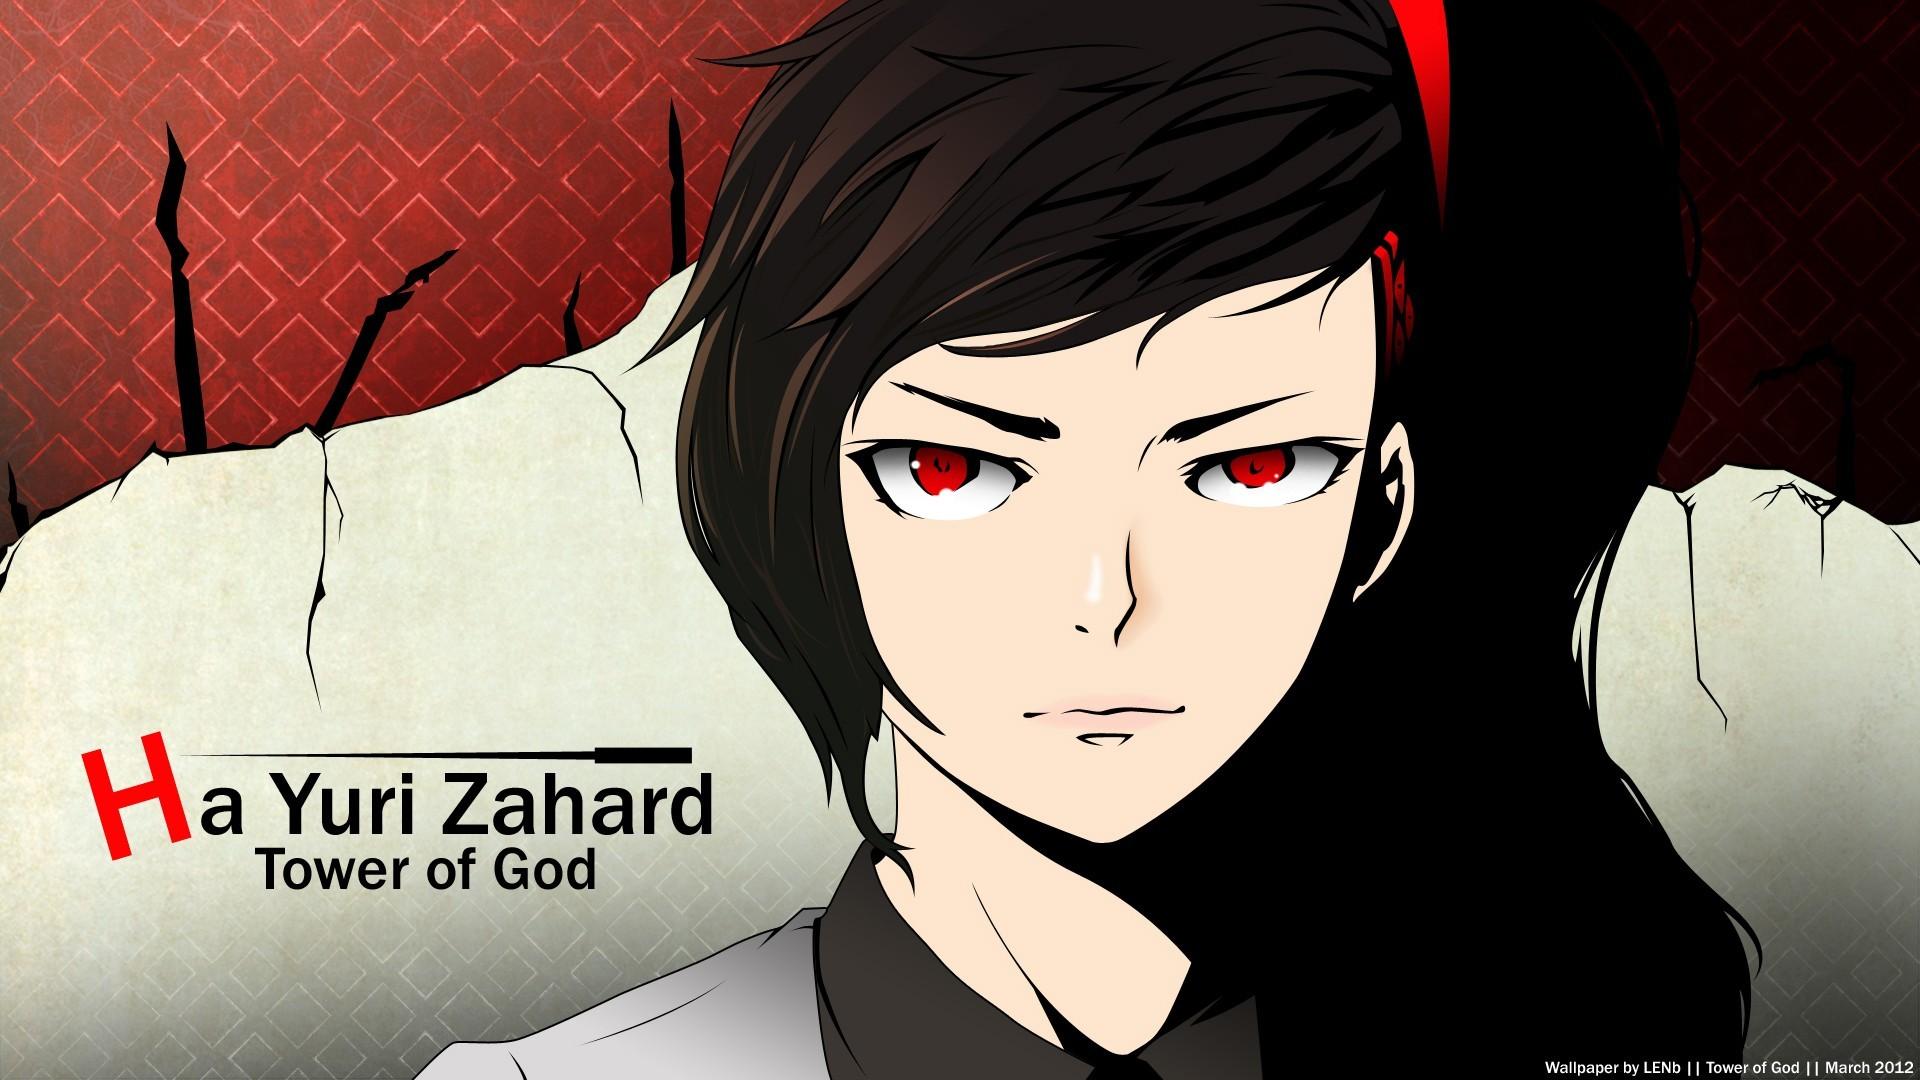 Wallpaper Illustration Anime Cartoon Black Hair Person